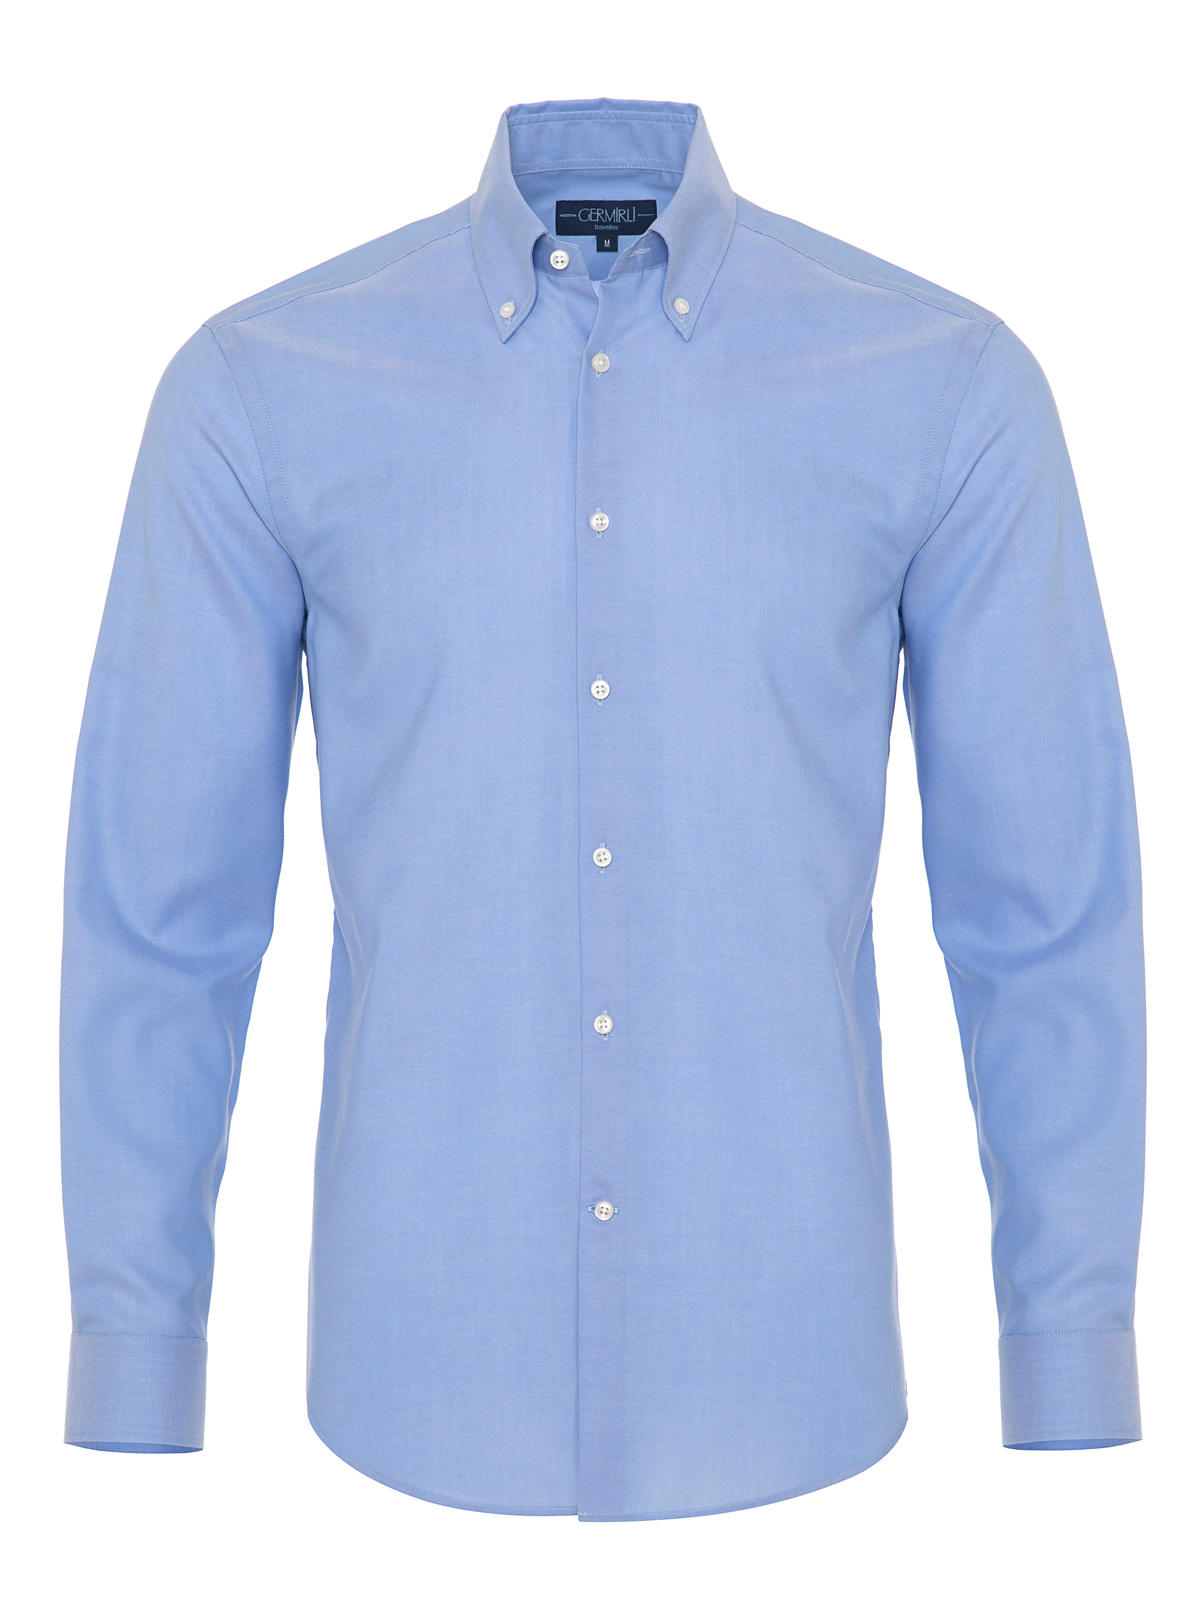 Germirli - Germirli Non Iron Blue Button Down Collar Tailor Fit Zero 24 Shirt